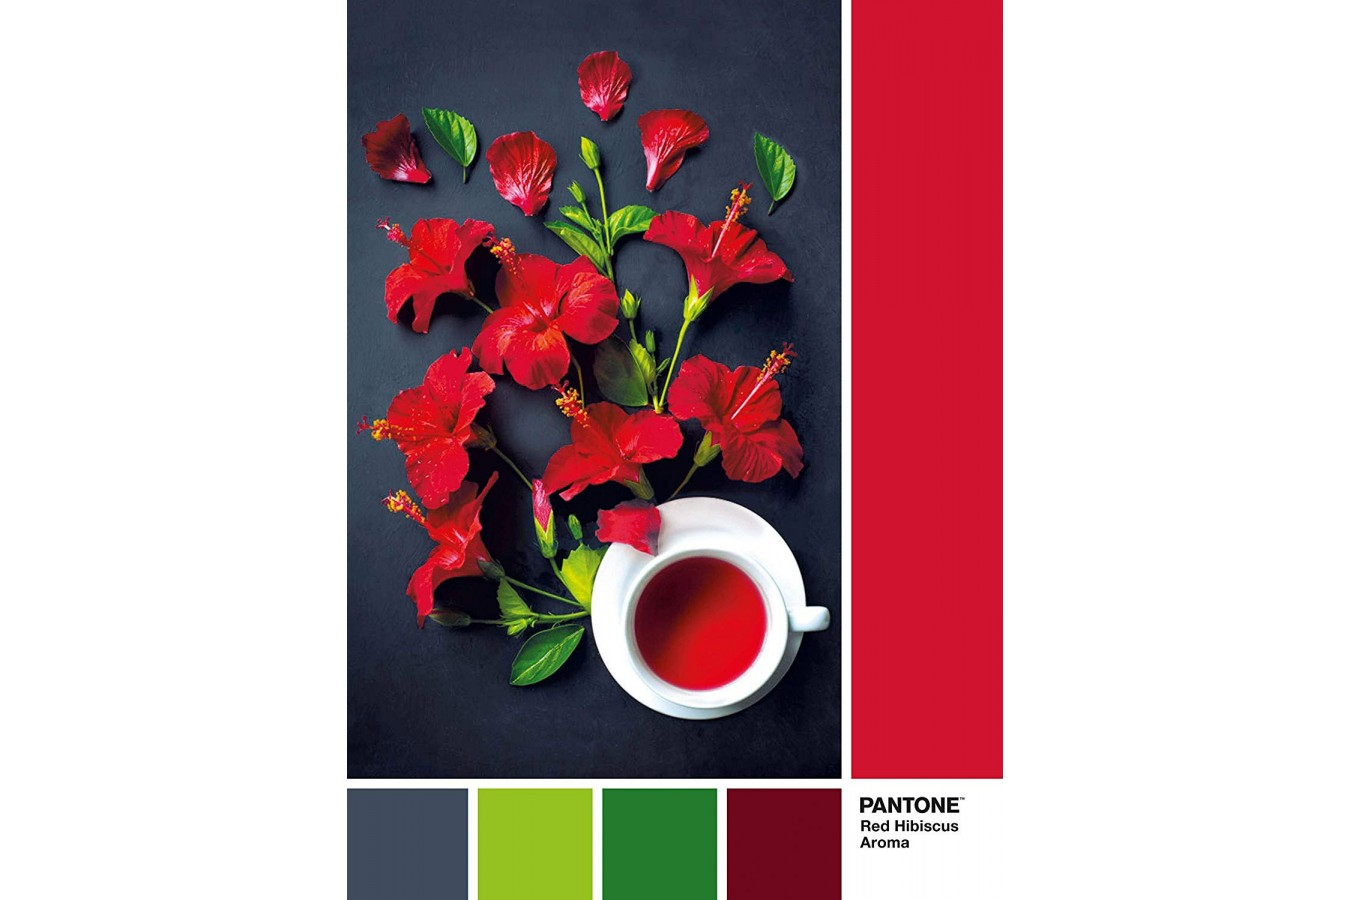 Puzzle Clementoni - Pantone - Goji Berry, 1.000 piese (39494) imagine